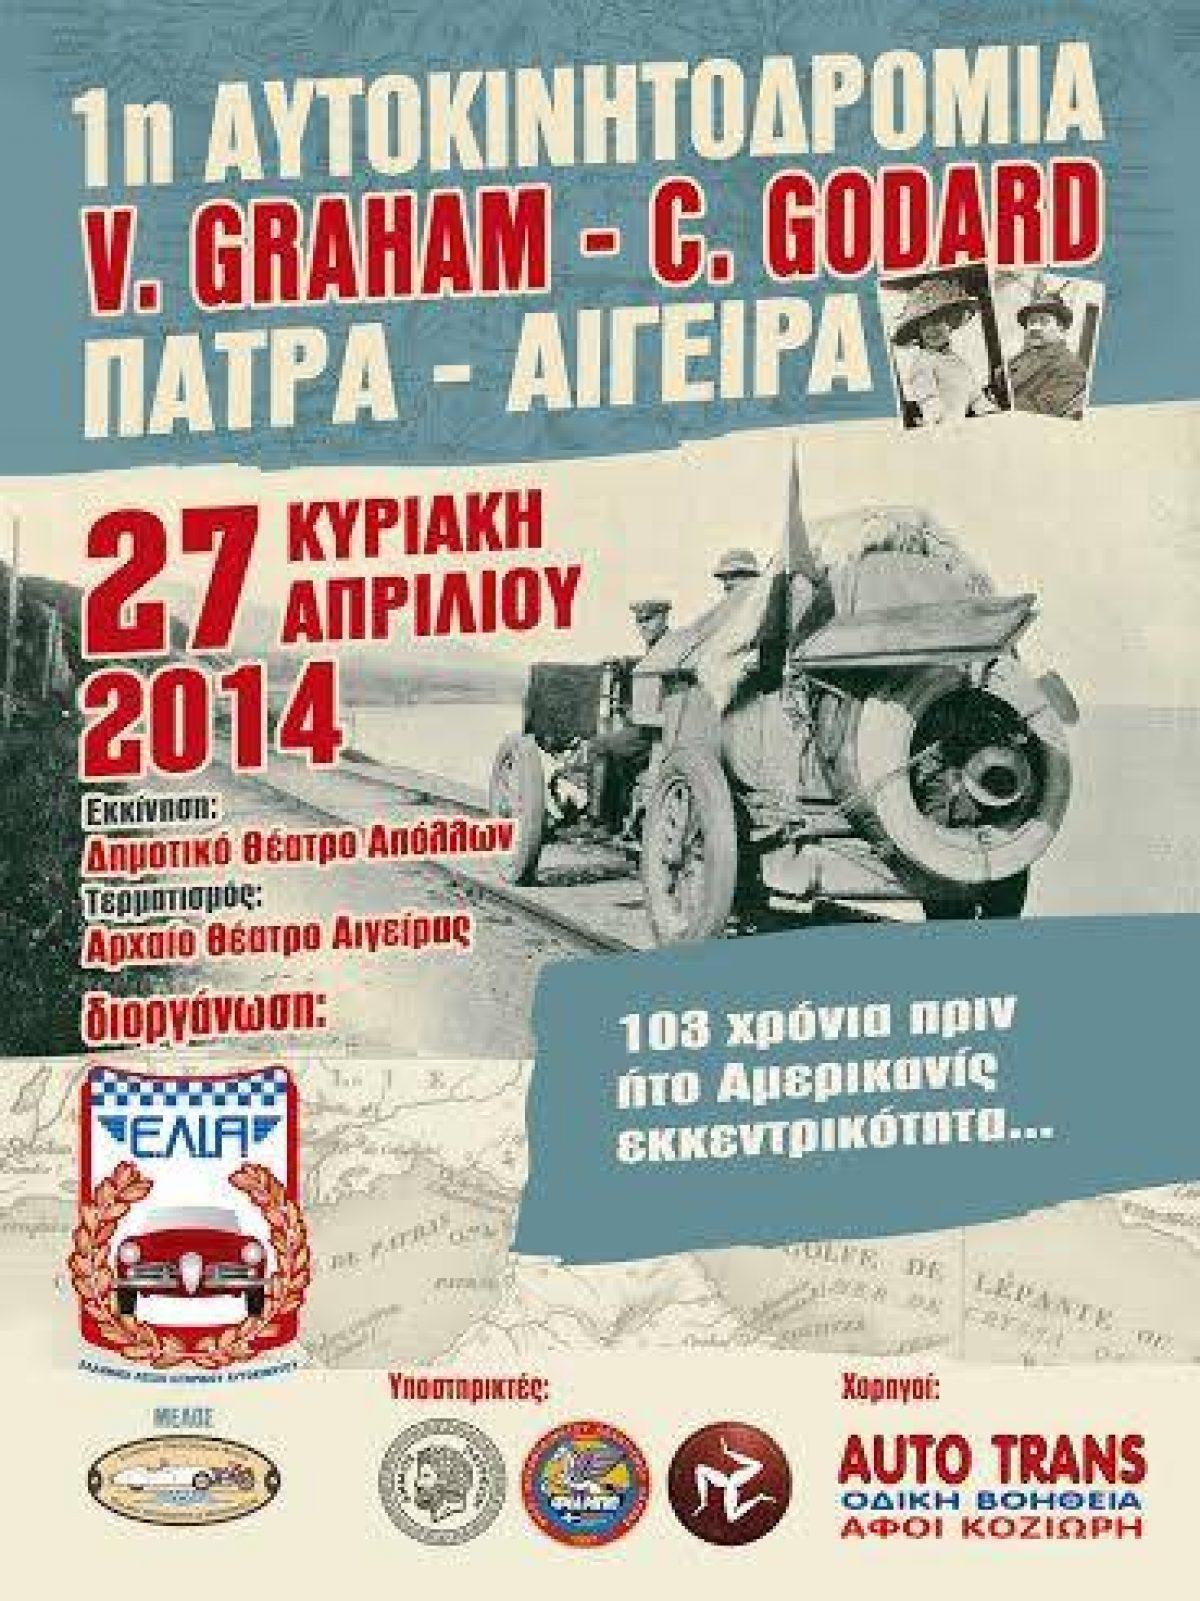 Regularity:Tour de Virginia Graham- Charles Godard 2014